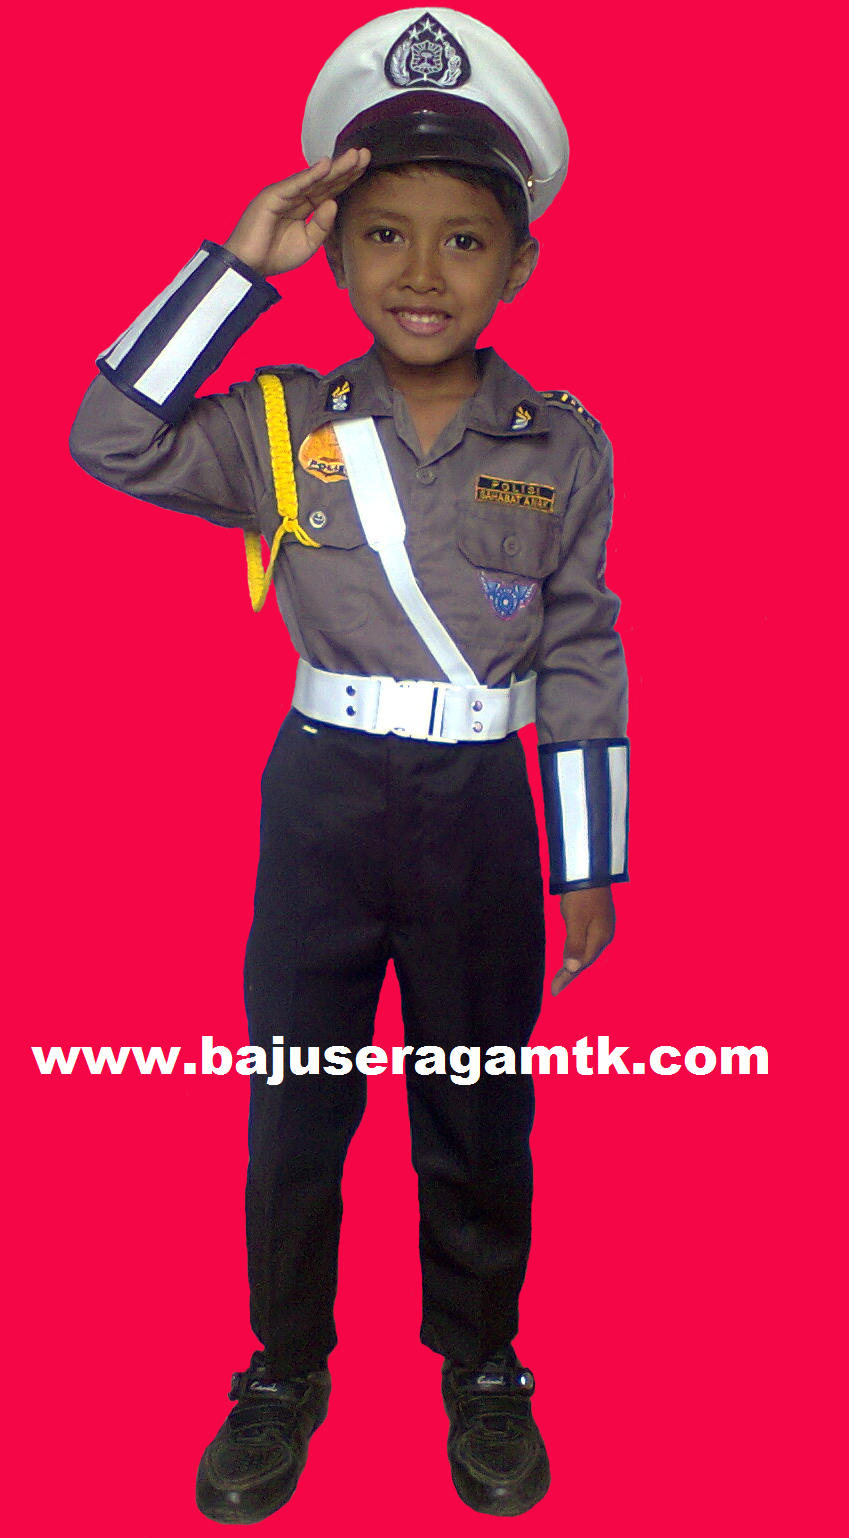 baju profesi anak baju kostum polantas anak baju polisi anak